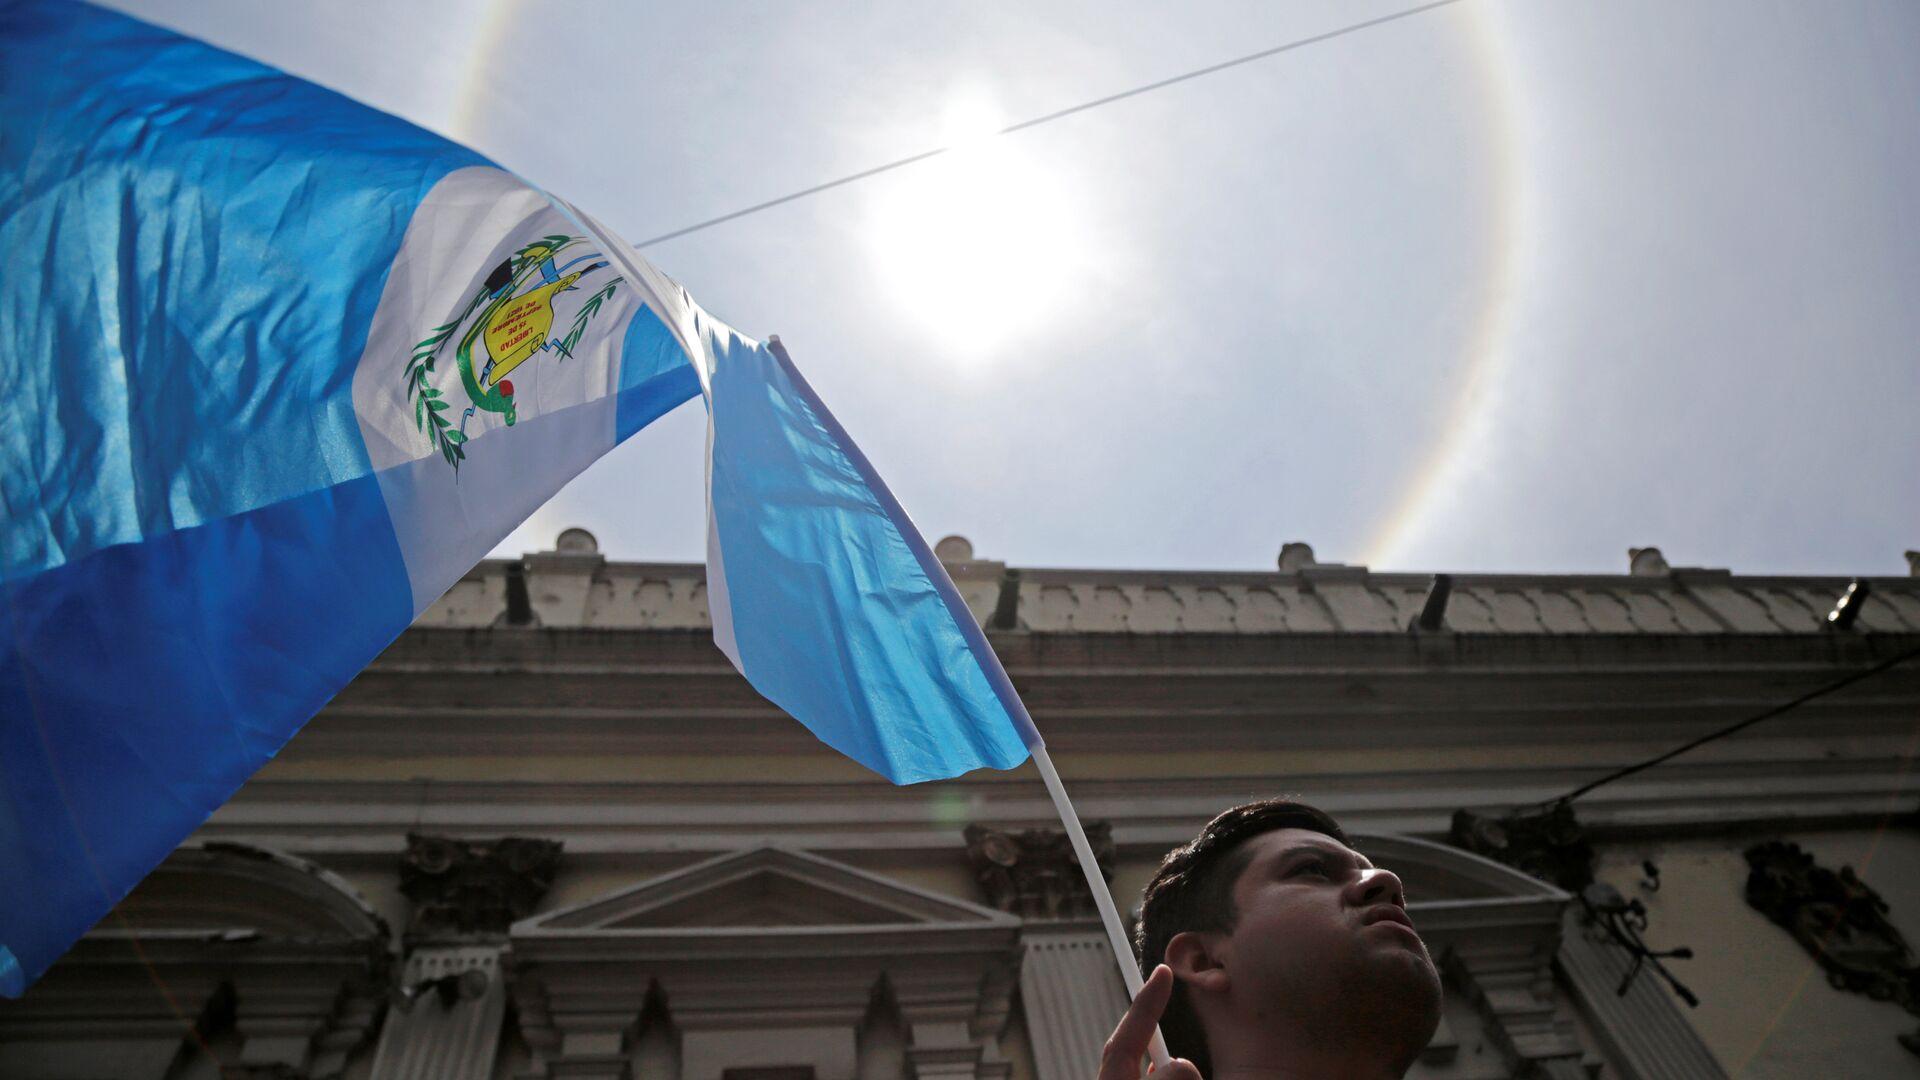 Bandera de Guatemala - Sputnik Mundo, 1920, 15.04.2021